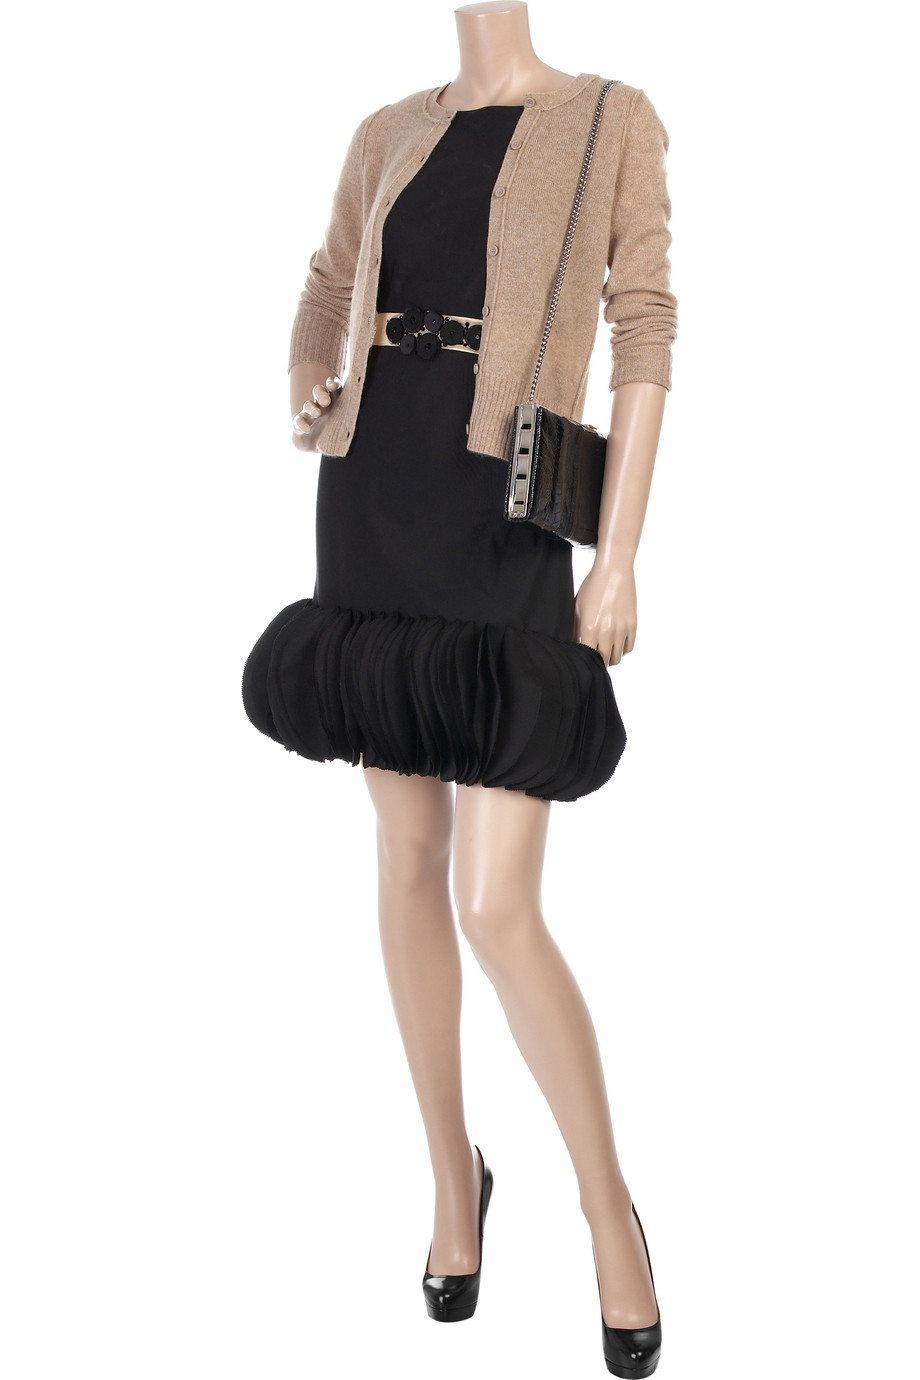 Christian Louboutin Alti 160mm Black Patent Reed Fashion